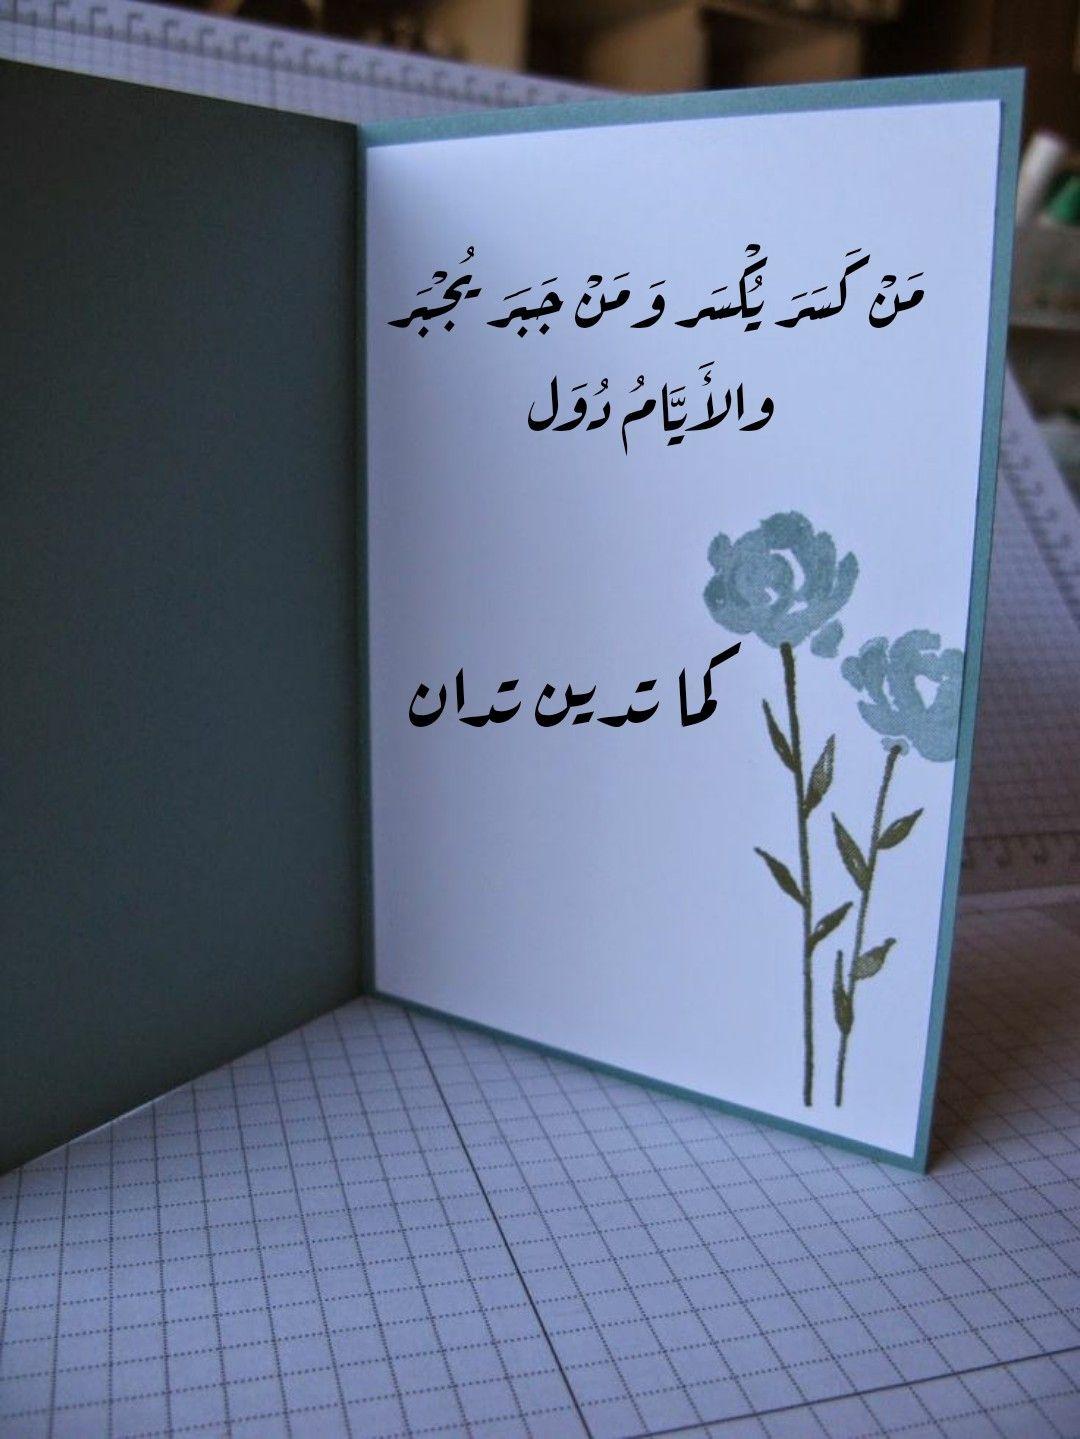 م ن ك س ر ي ك س ر و م ن ج ب ر ي ج ب ر والأ ي ام د و ل كما تدين تدان Words Quotes Quran Quotes Love Quran Quotes